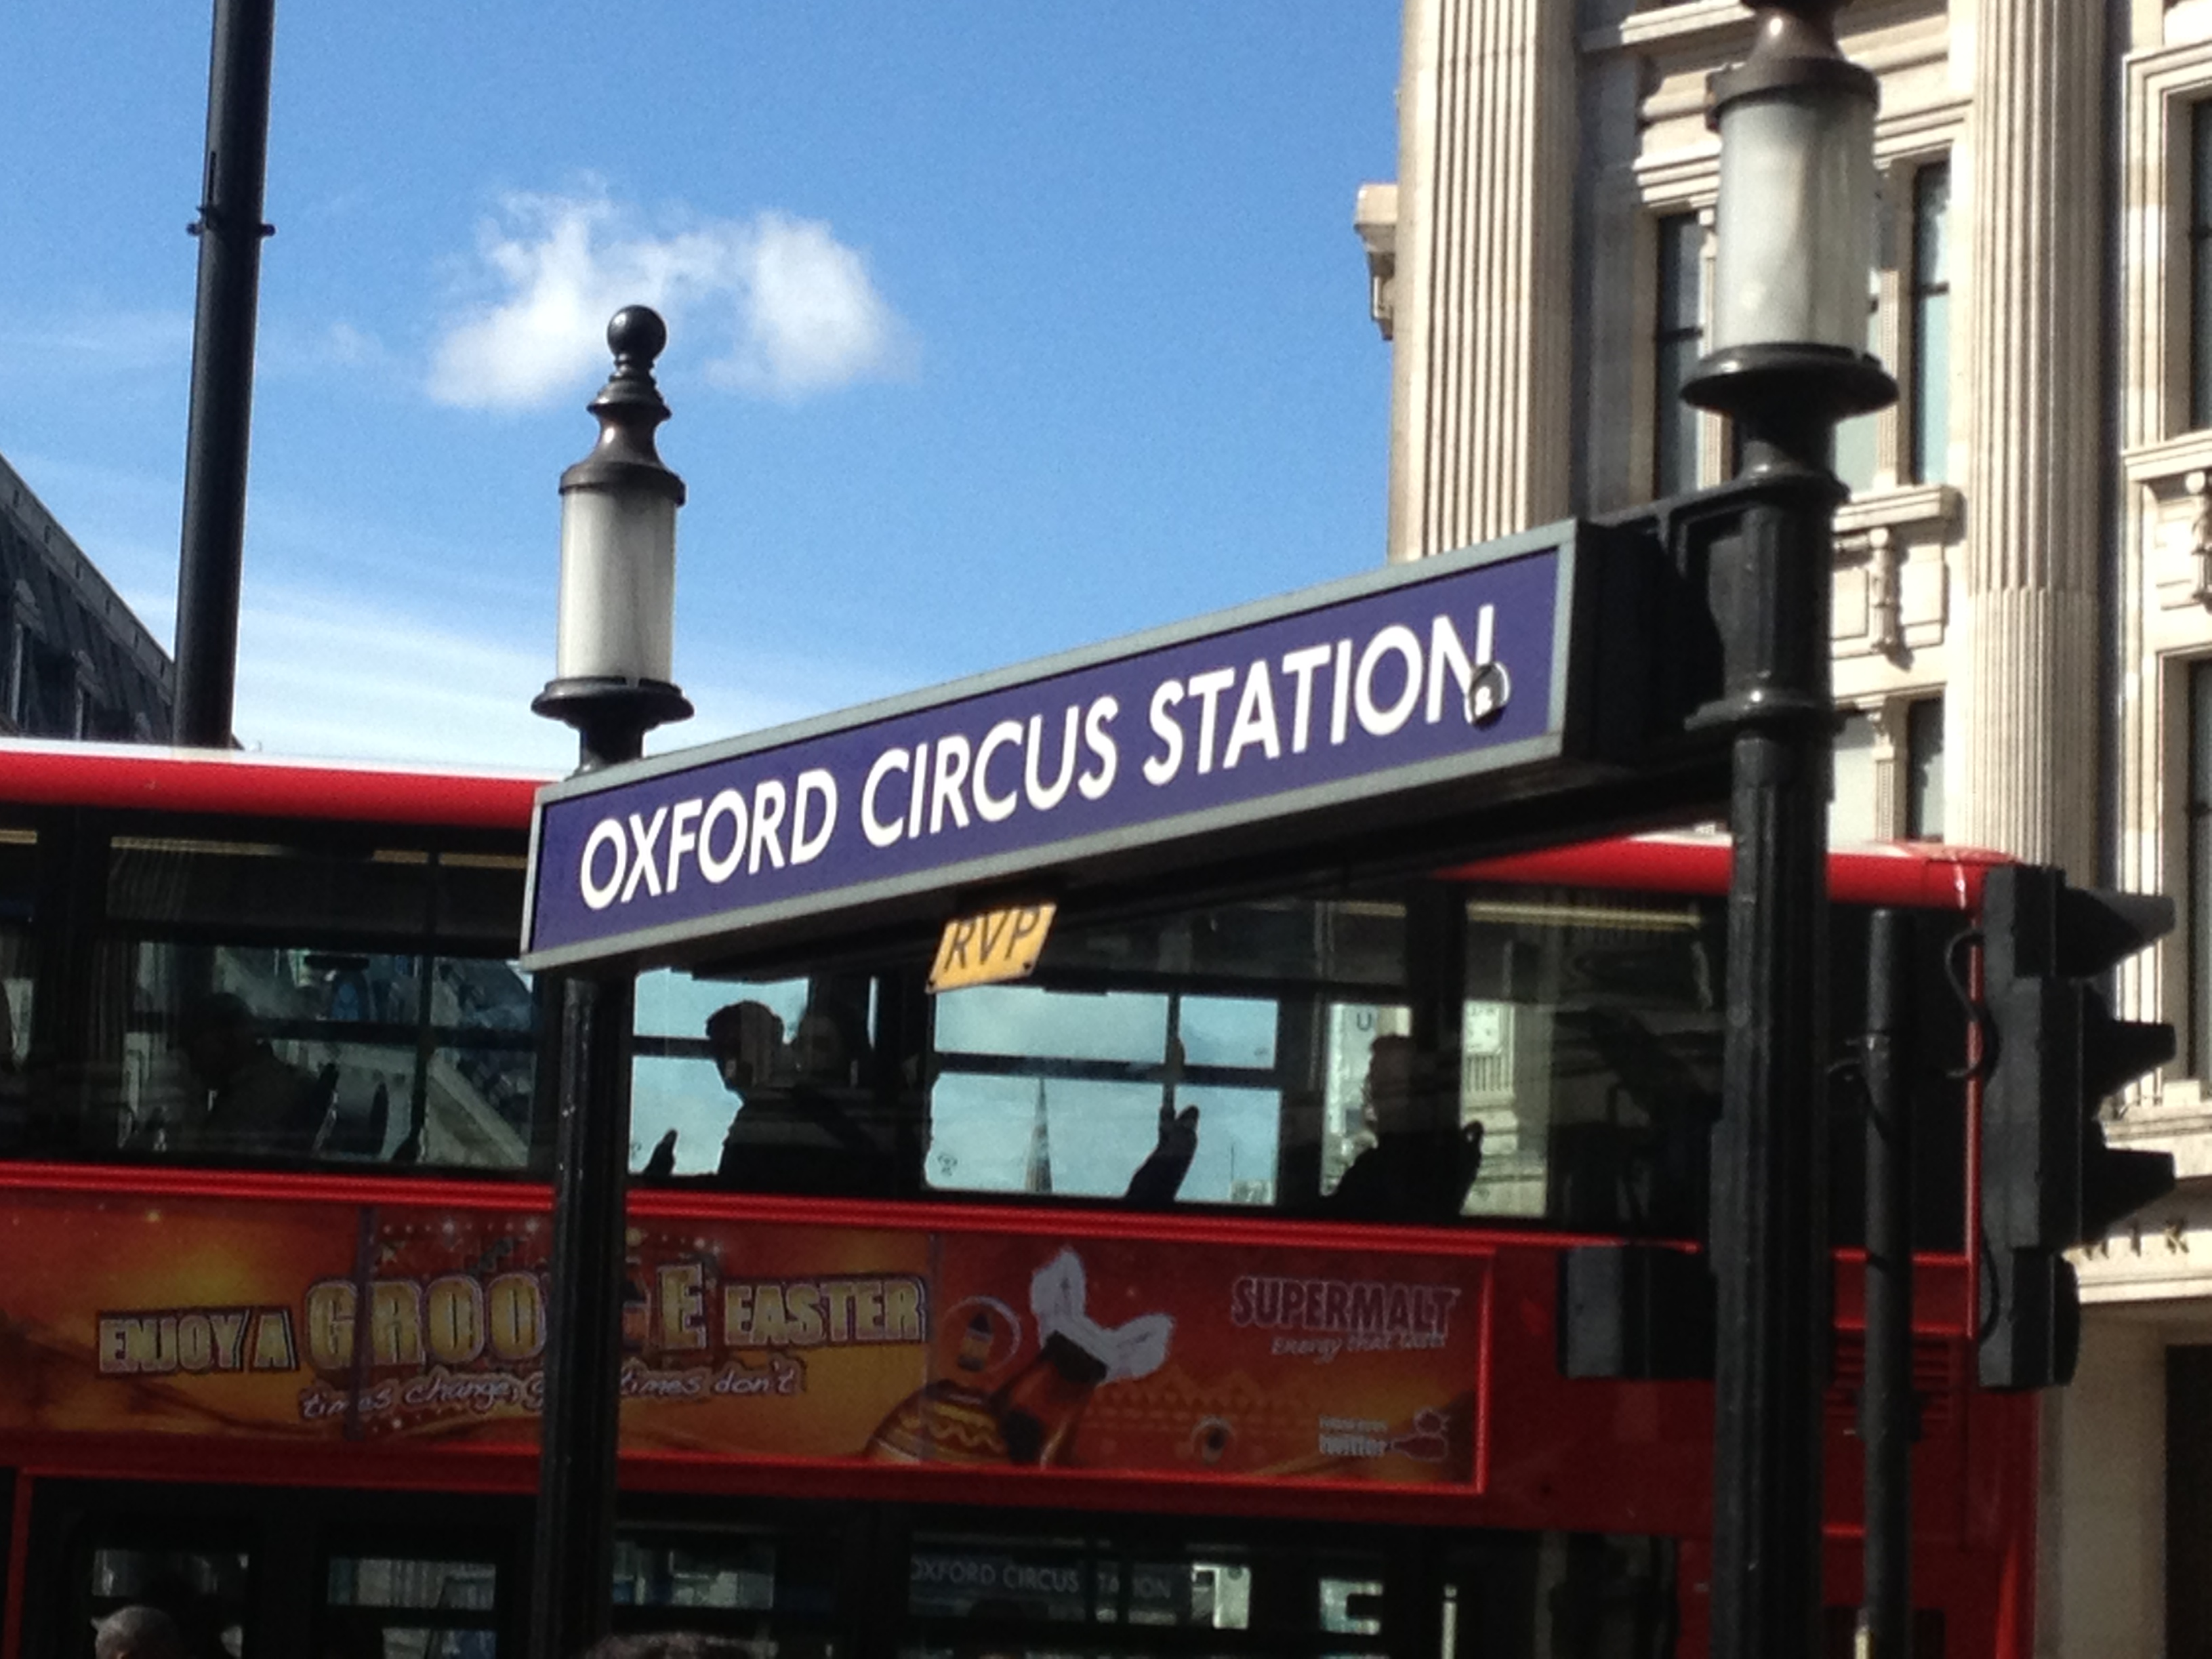 La rue des commerces: Oxford Circus